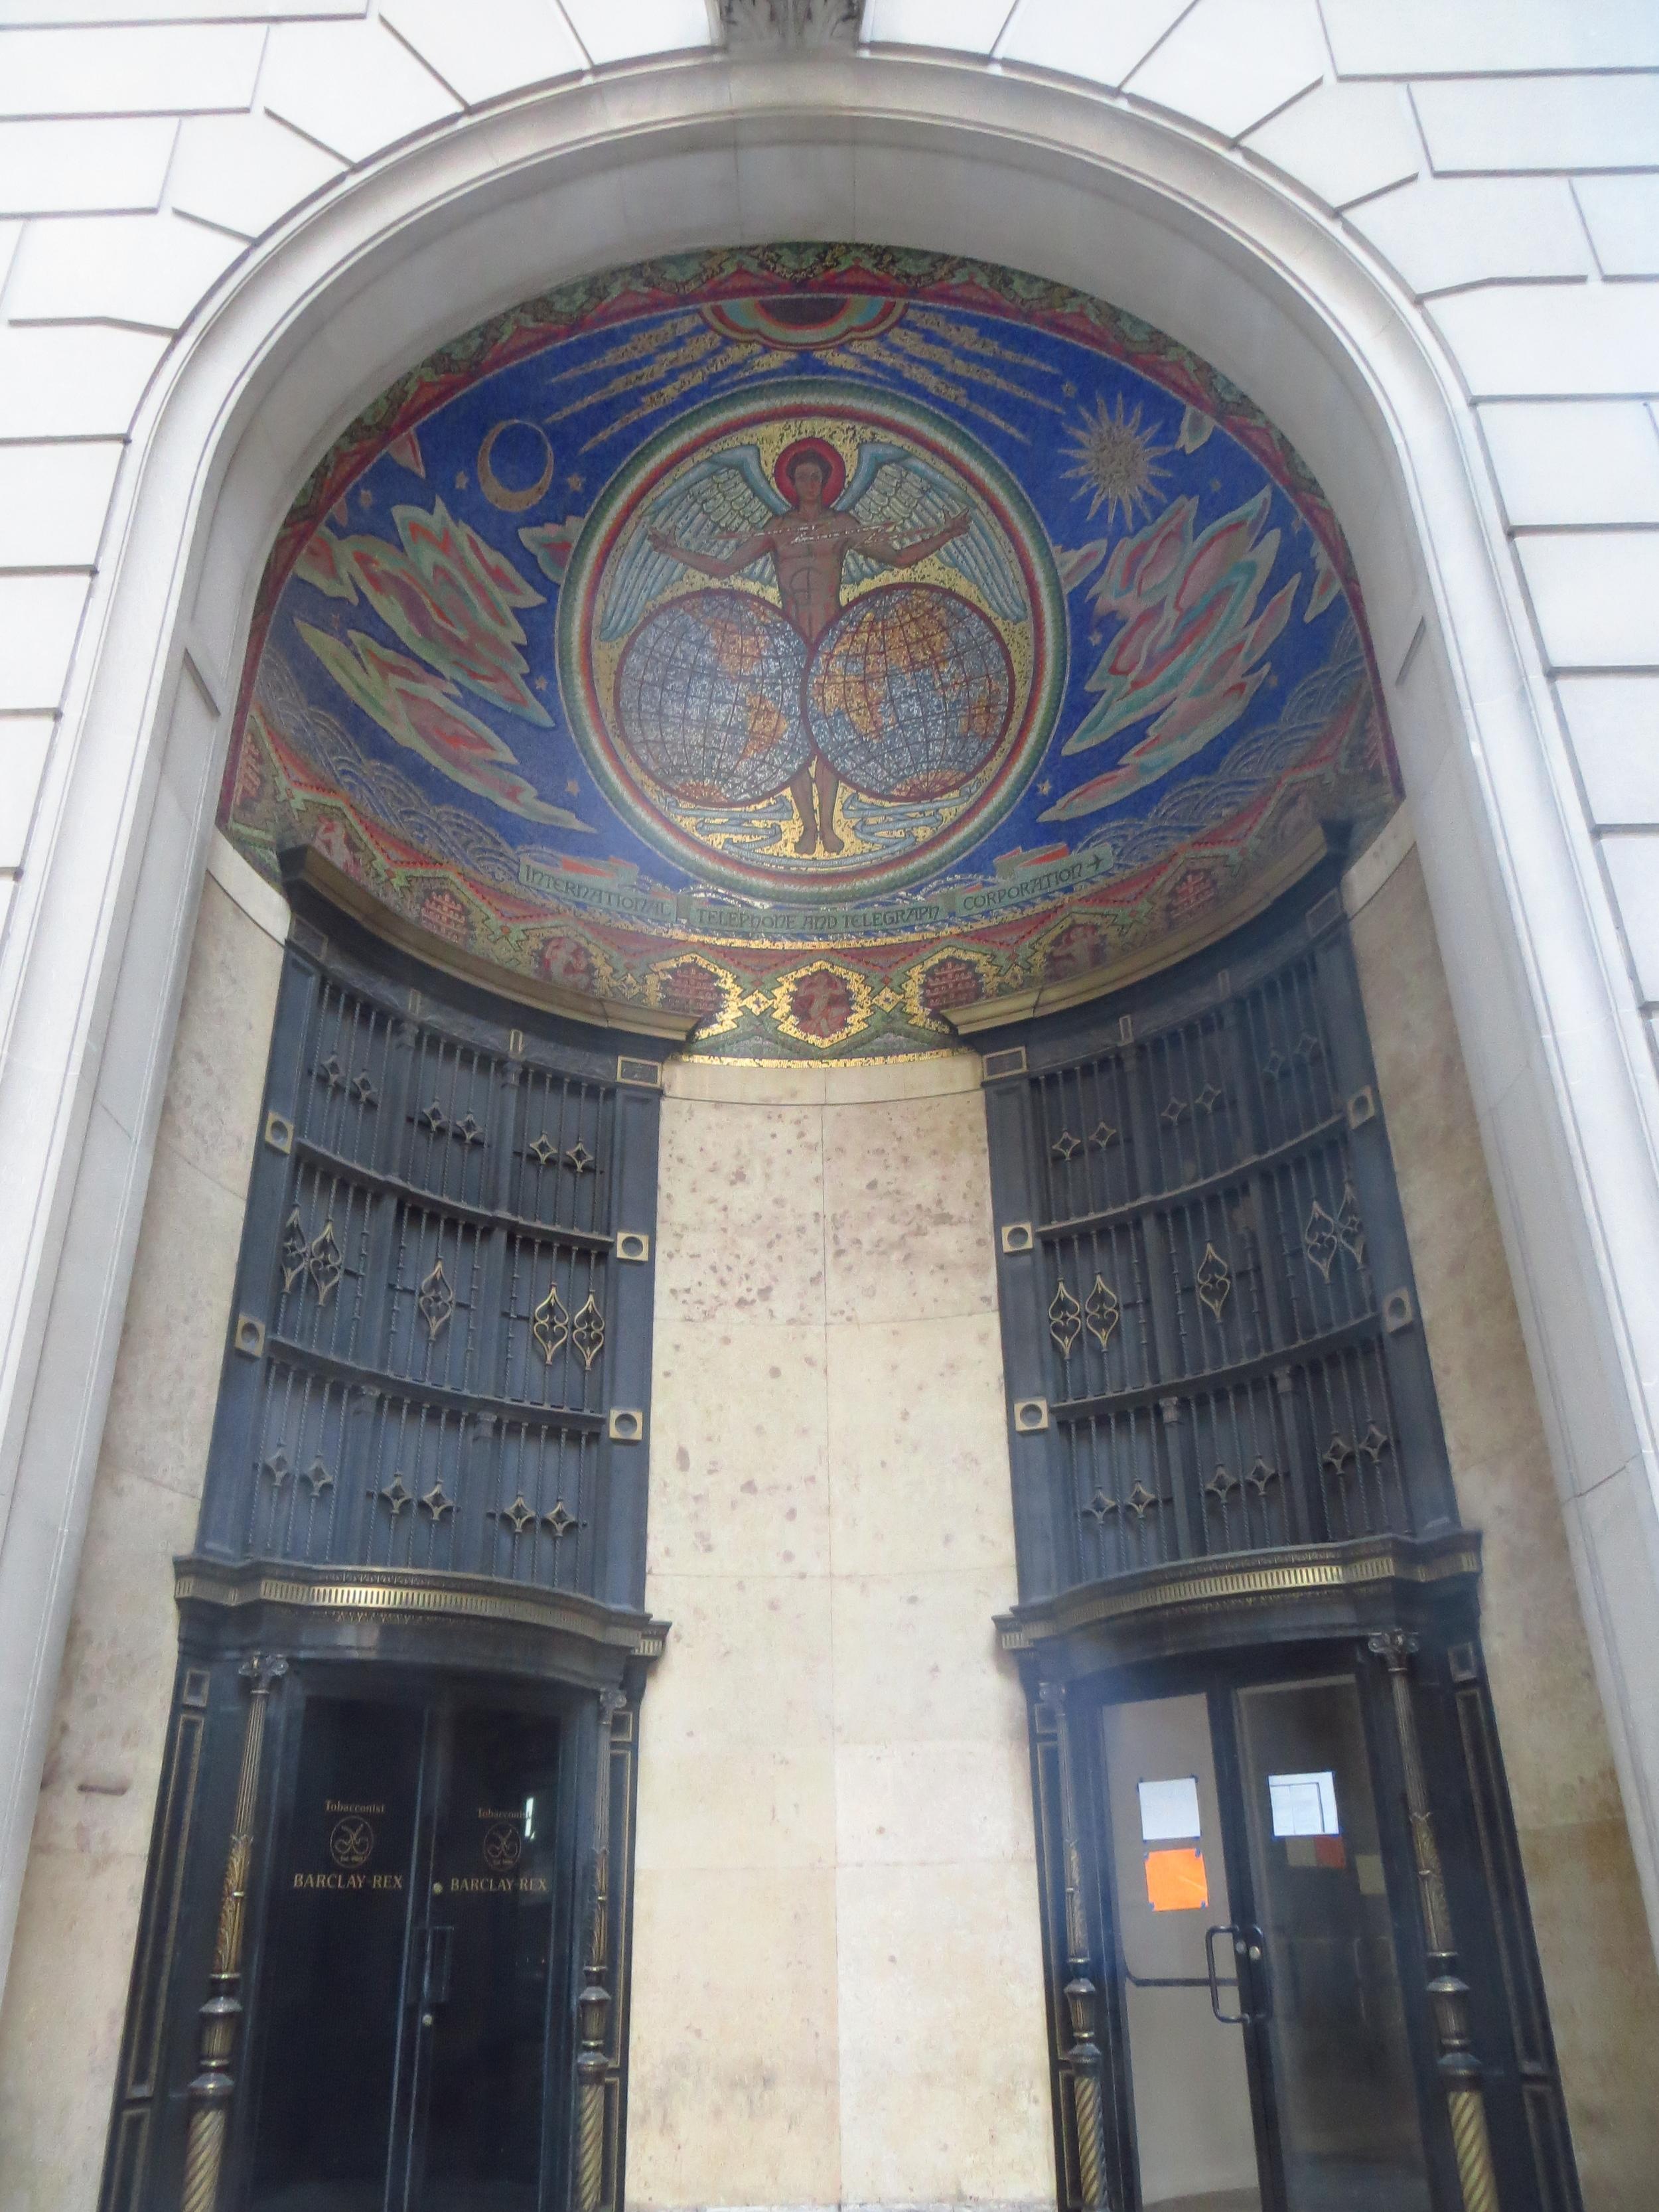 ITT Corporation Mosaic